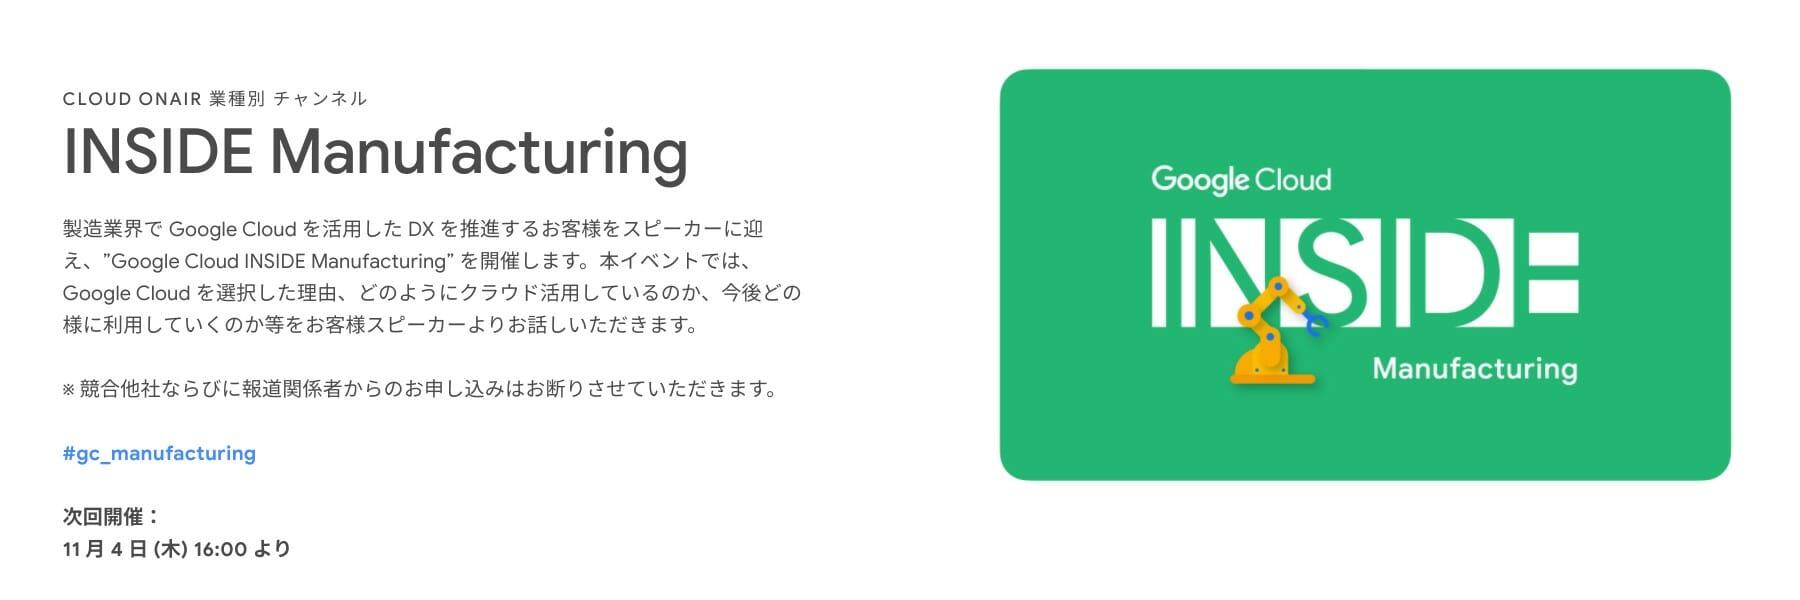 [GCP] Google Cloud INSIDE Manufacturing